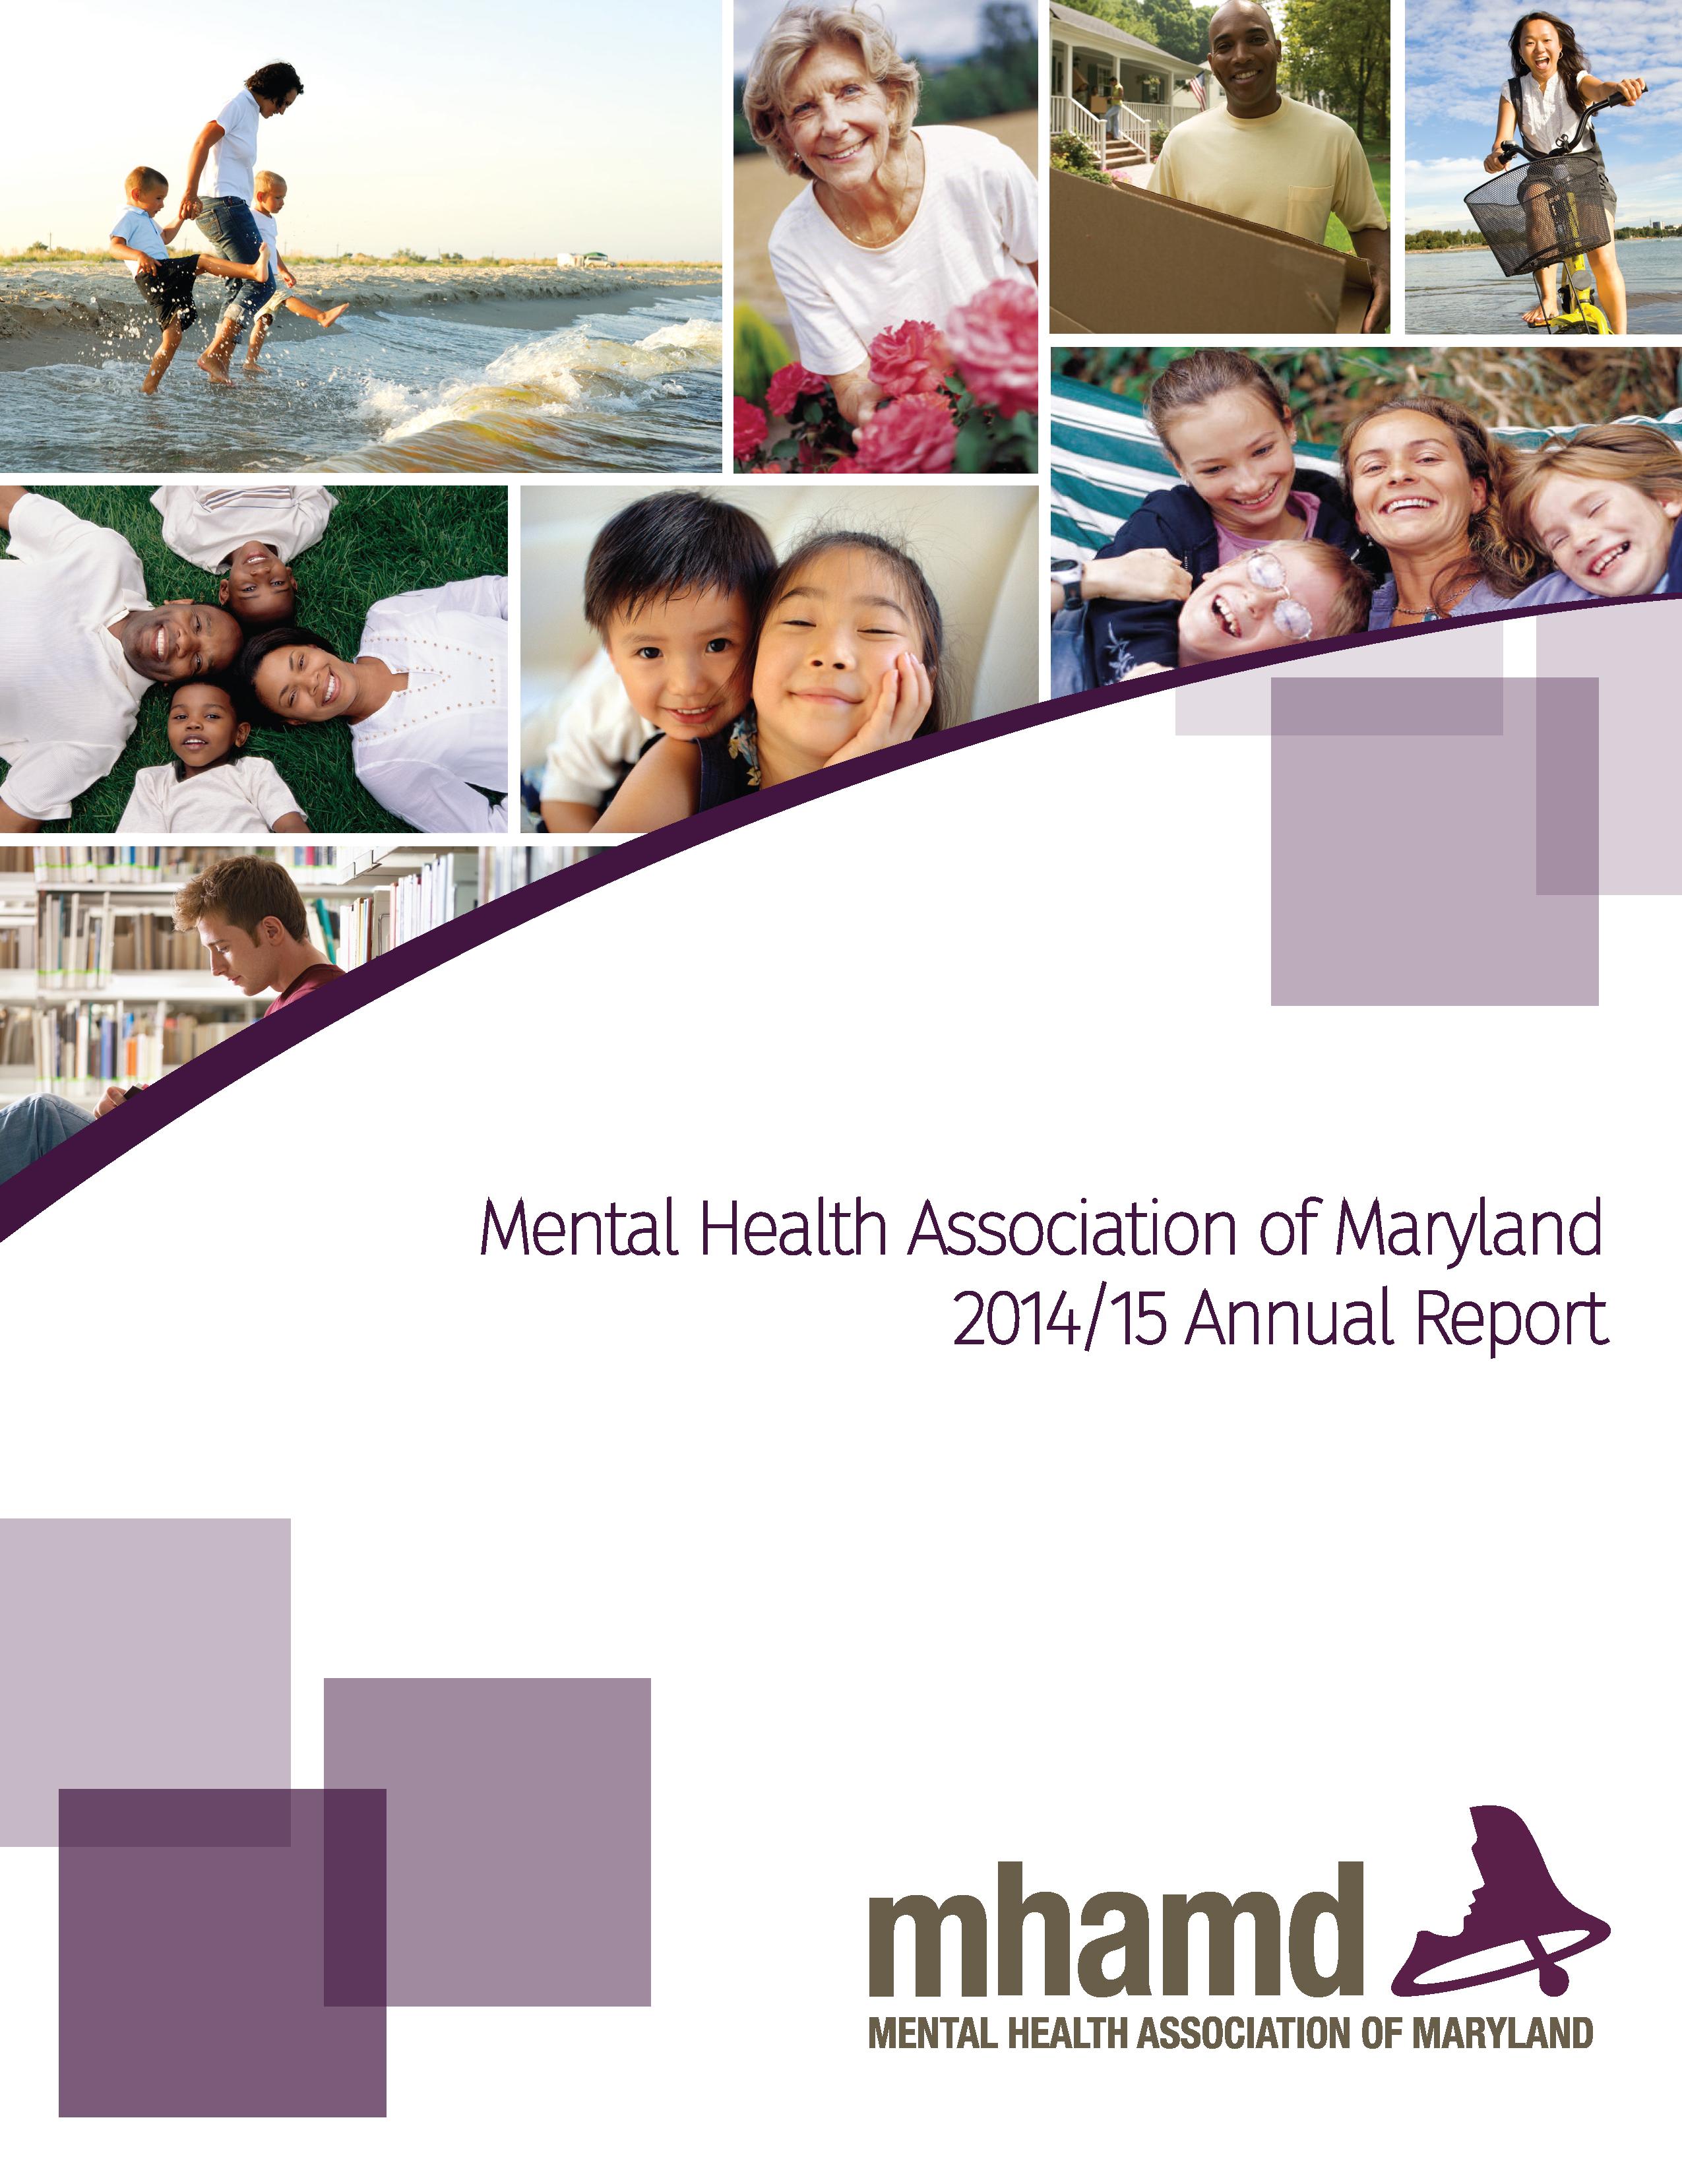 Annual Report Cover 13.14